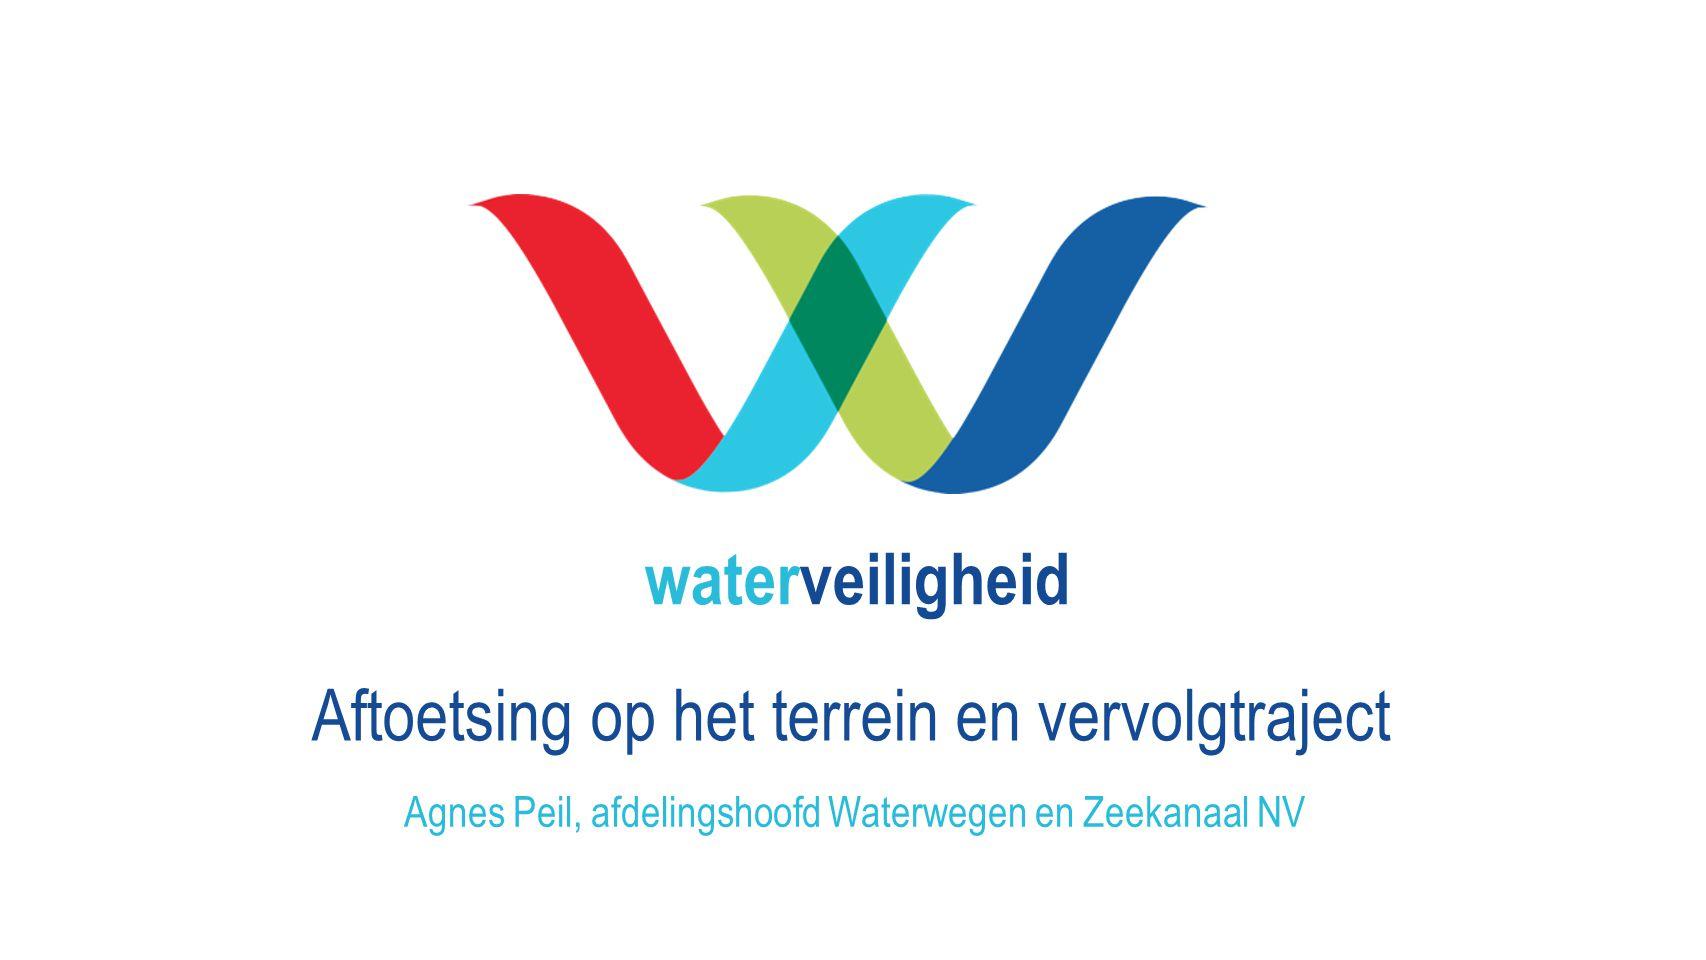 waterveiligheid Aftoetsing op het terrein en vervolgtraject Agnes Peil, afdelingshoofd Waterwegen en Zeekanaal NV